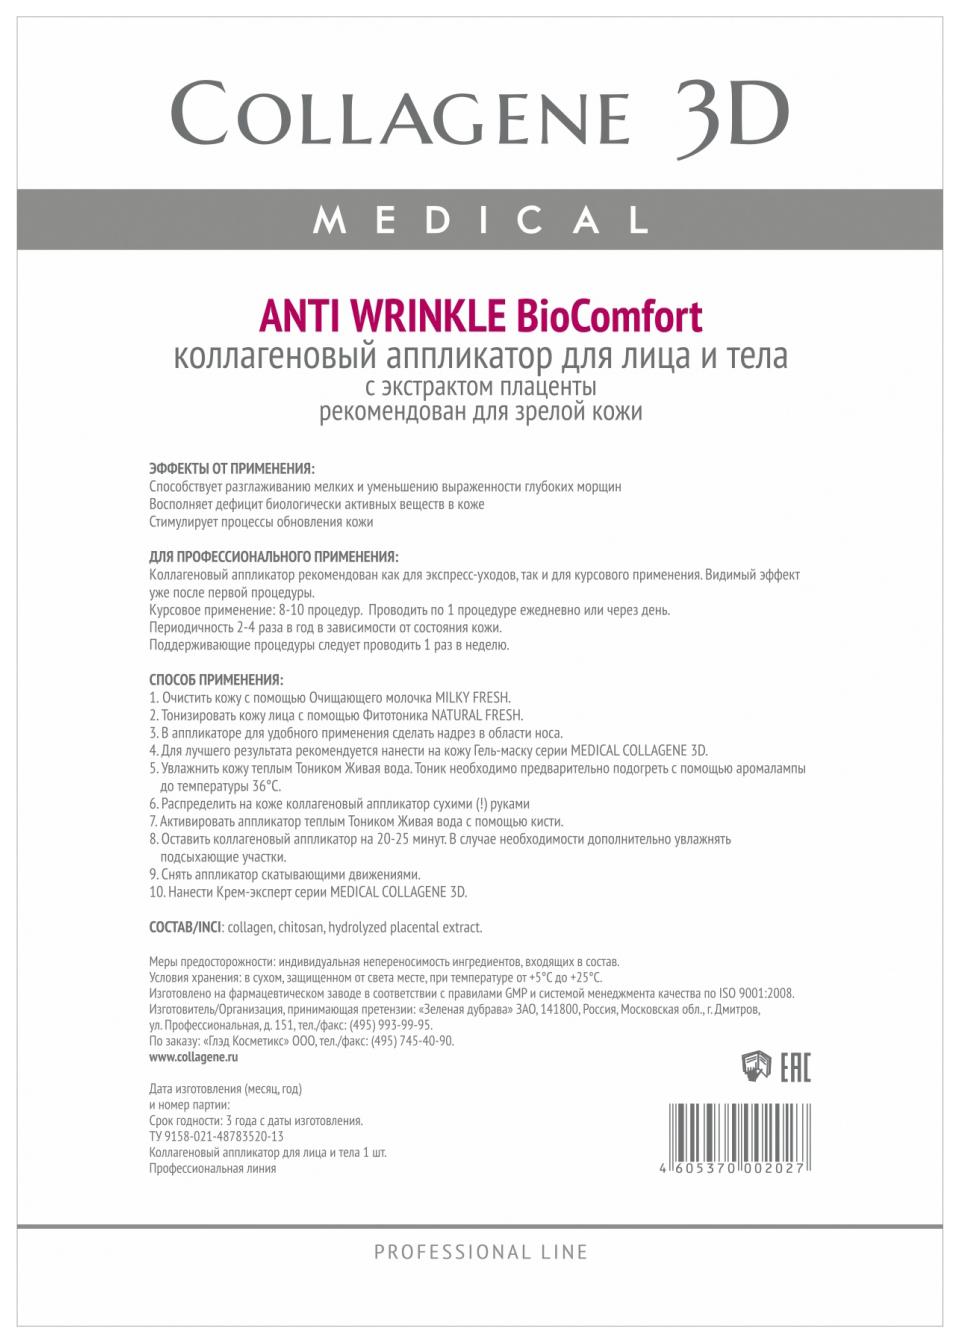 Маска для лица Medical Collagene 3D Anti Wrinkle Аппликатор BioComfort A4 1 шт фото